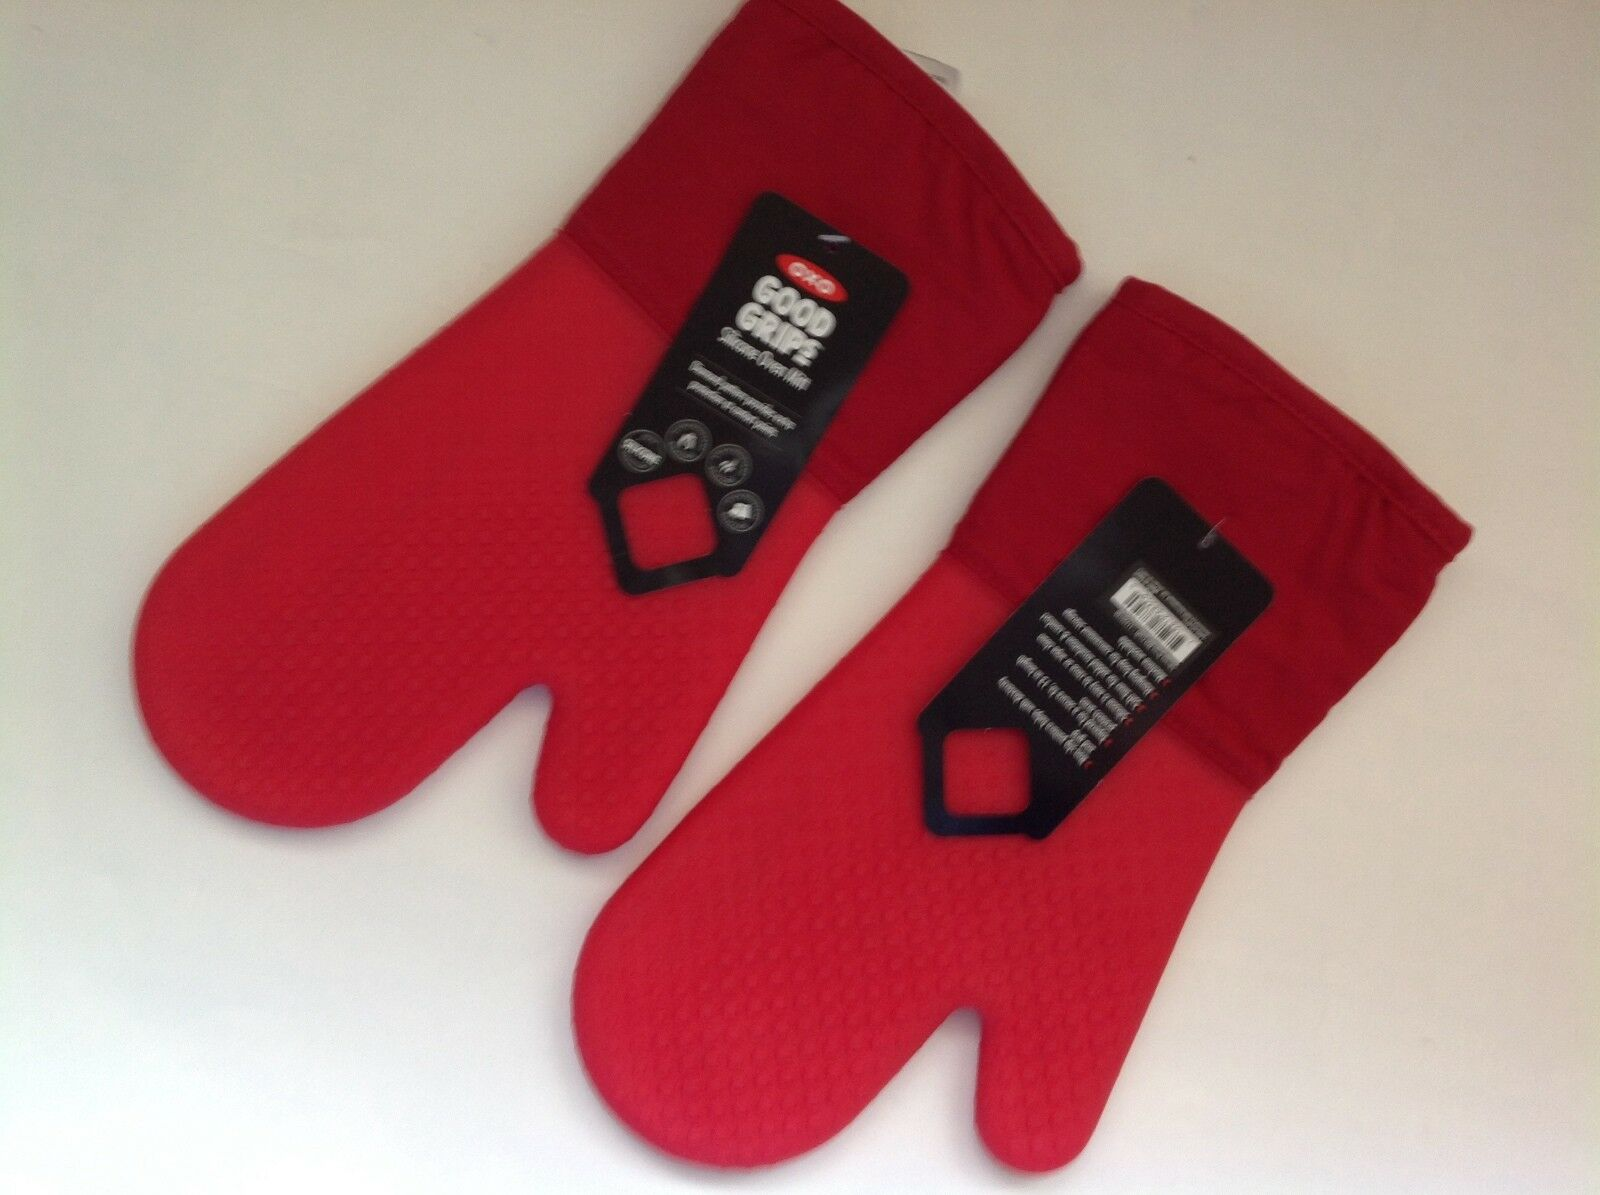 NEUF OXO GOOD GRIPS SET de 2 maniques-Rouge